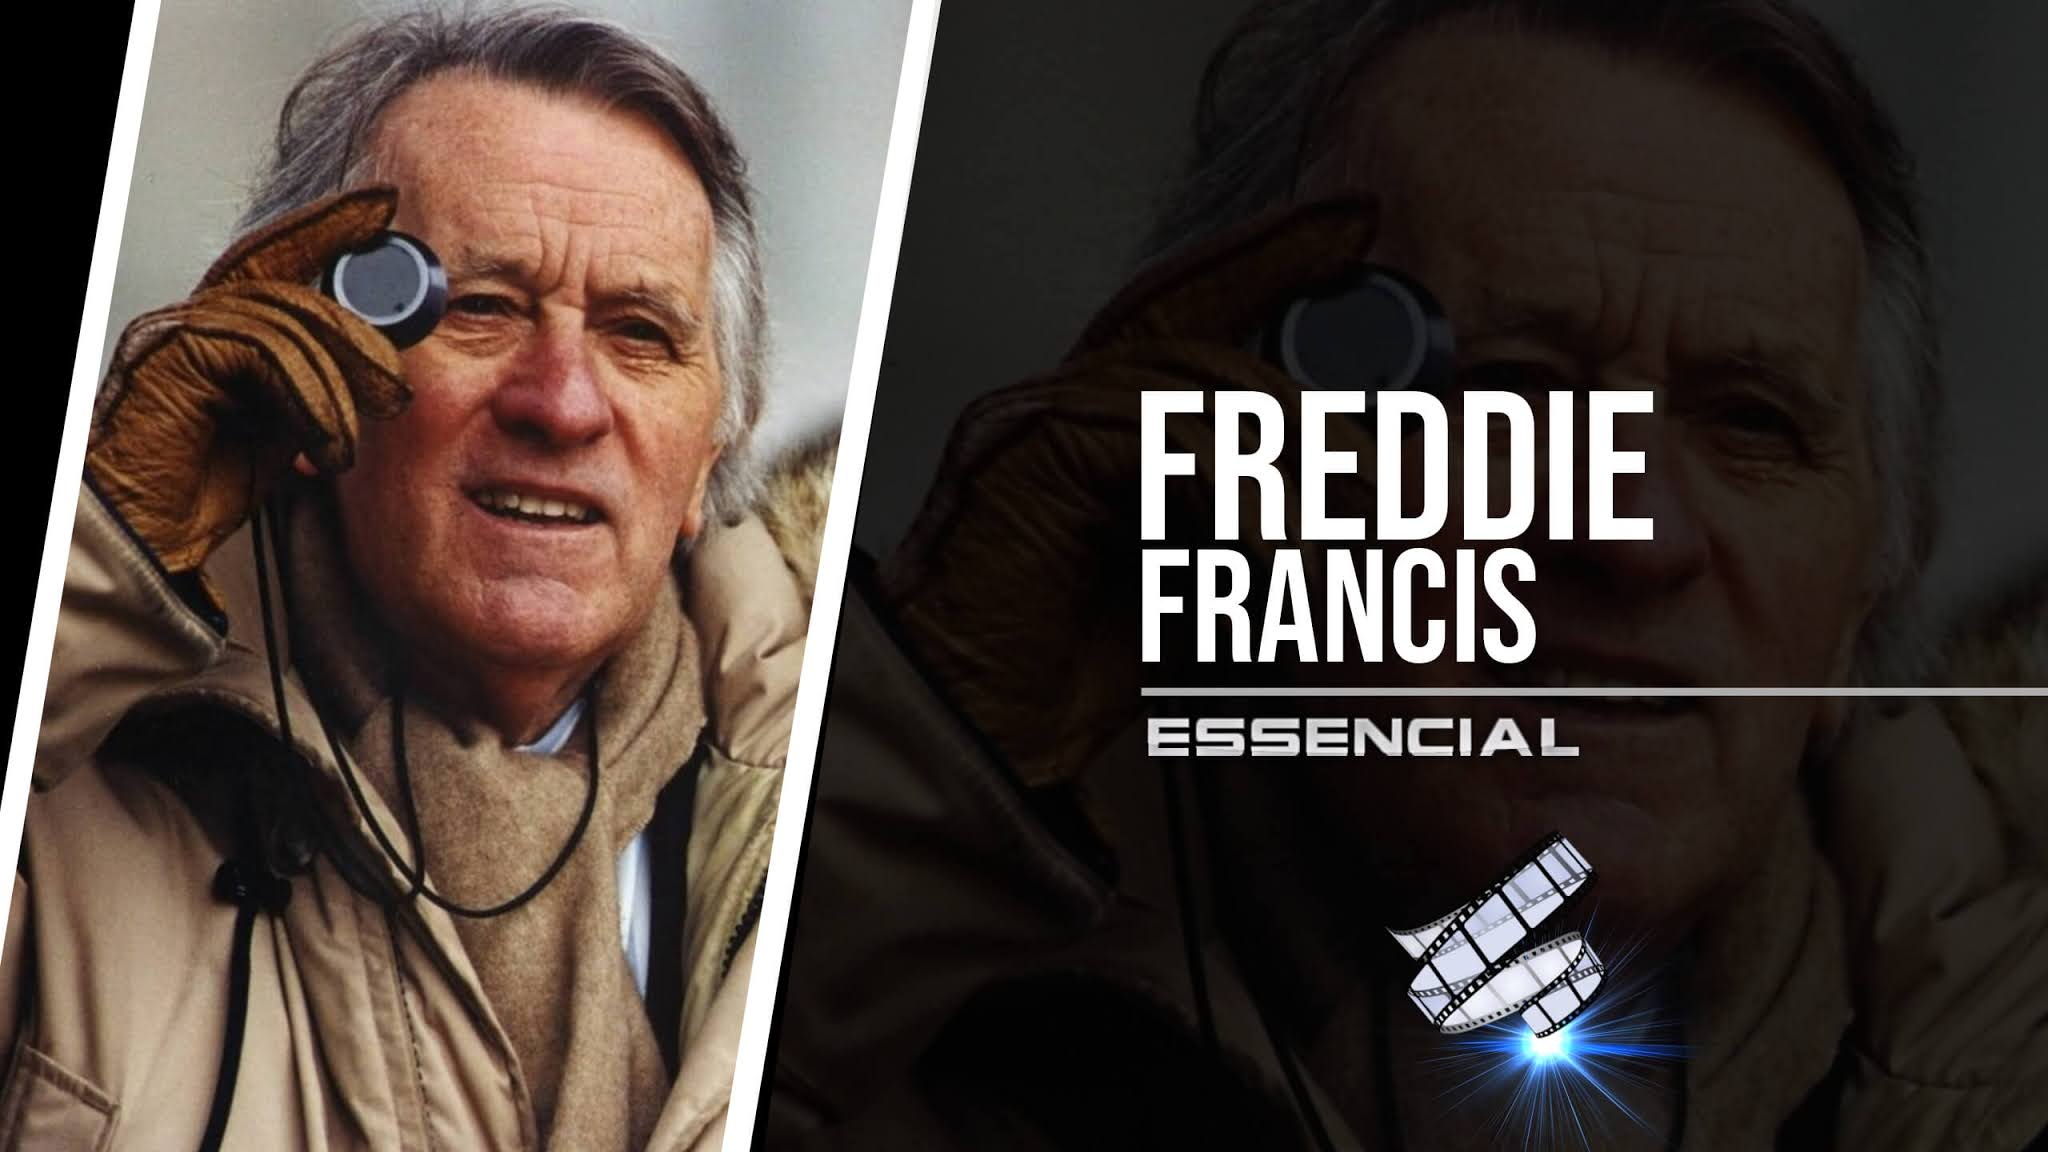 freddie-francis-10-filmes-essenciais